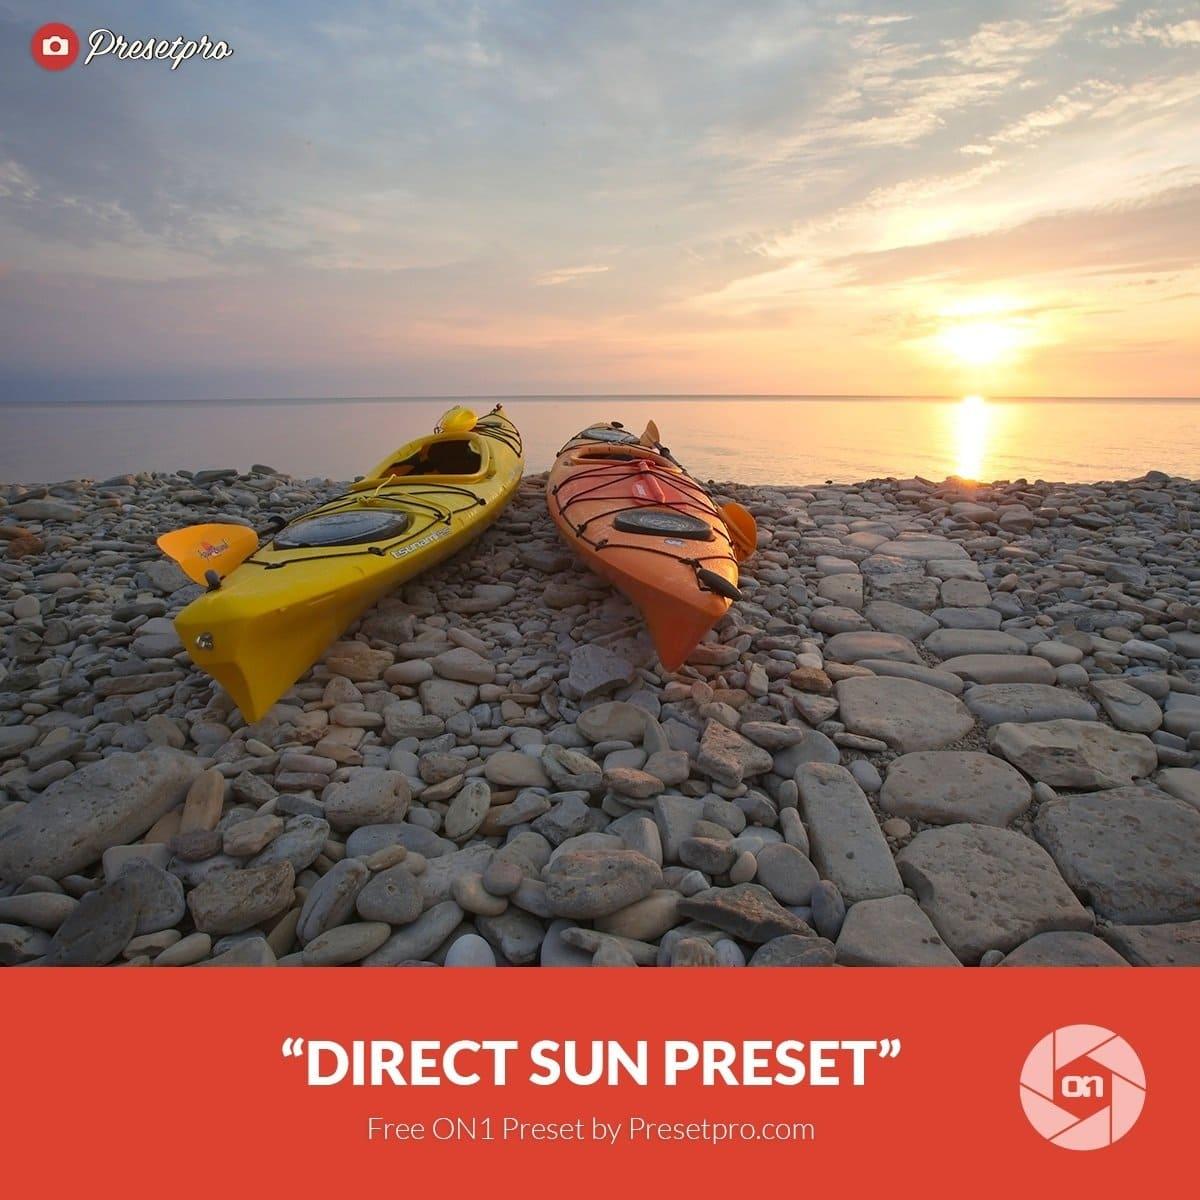 Free-On1-Preset-Direct-Sun-Presetpro.com